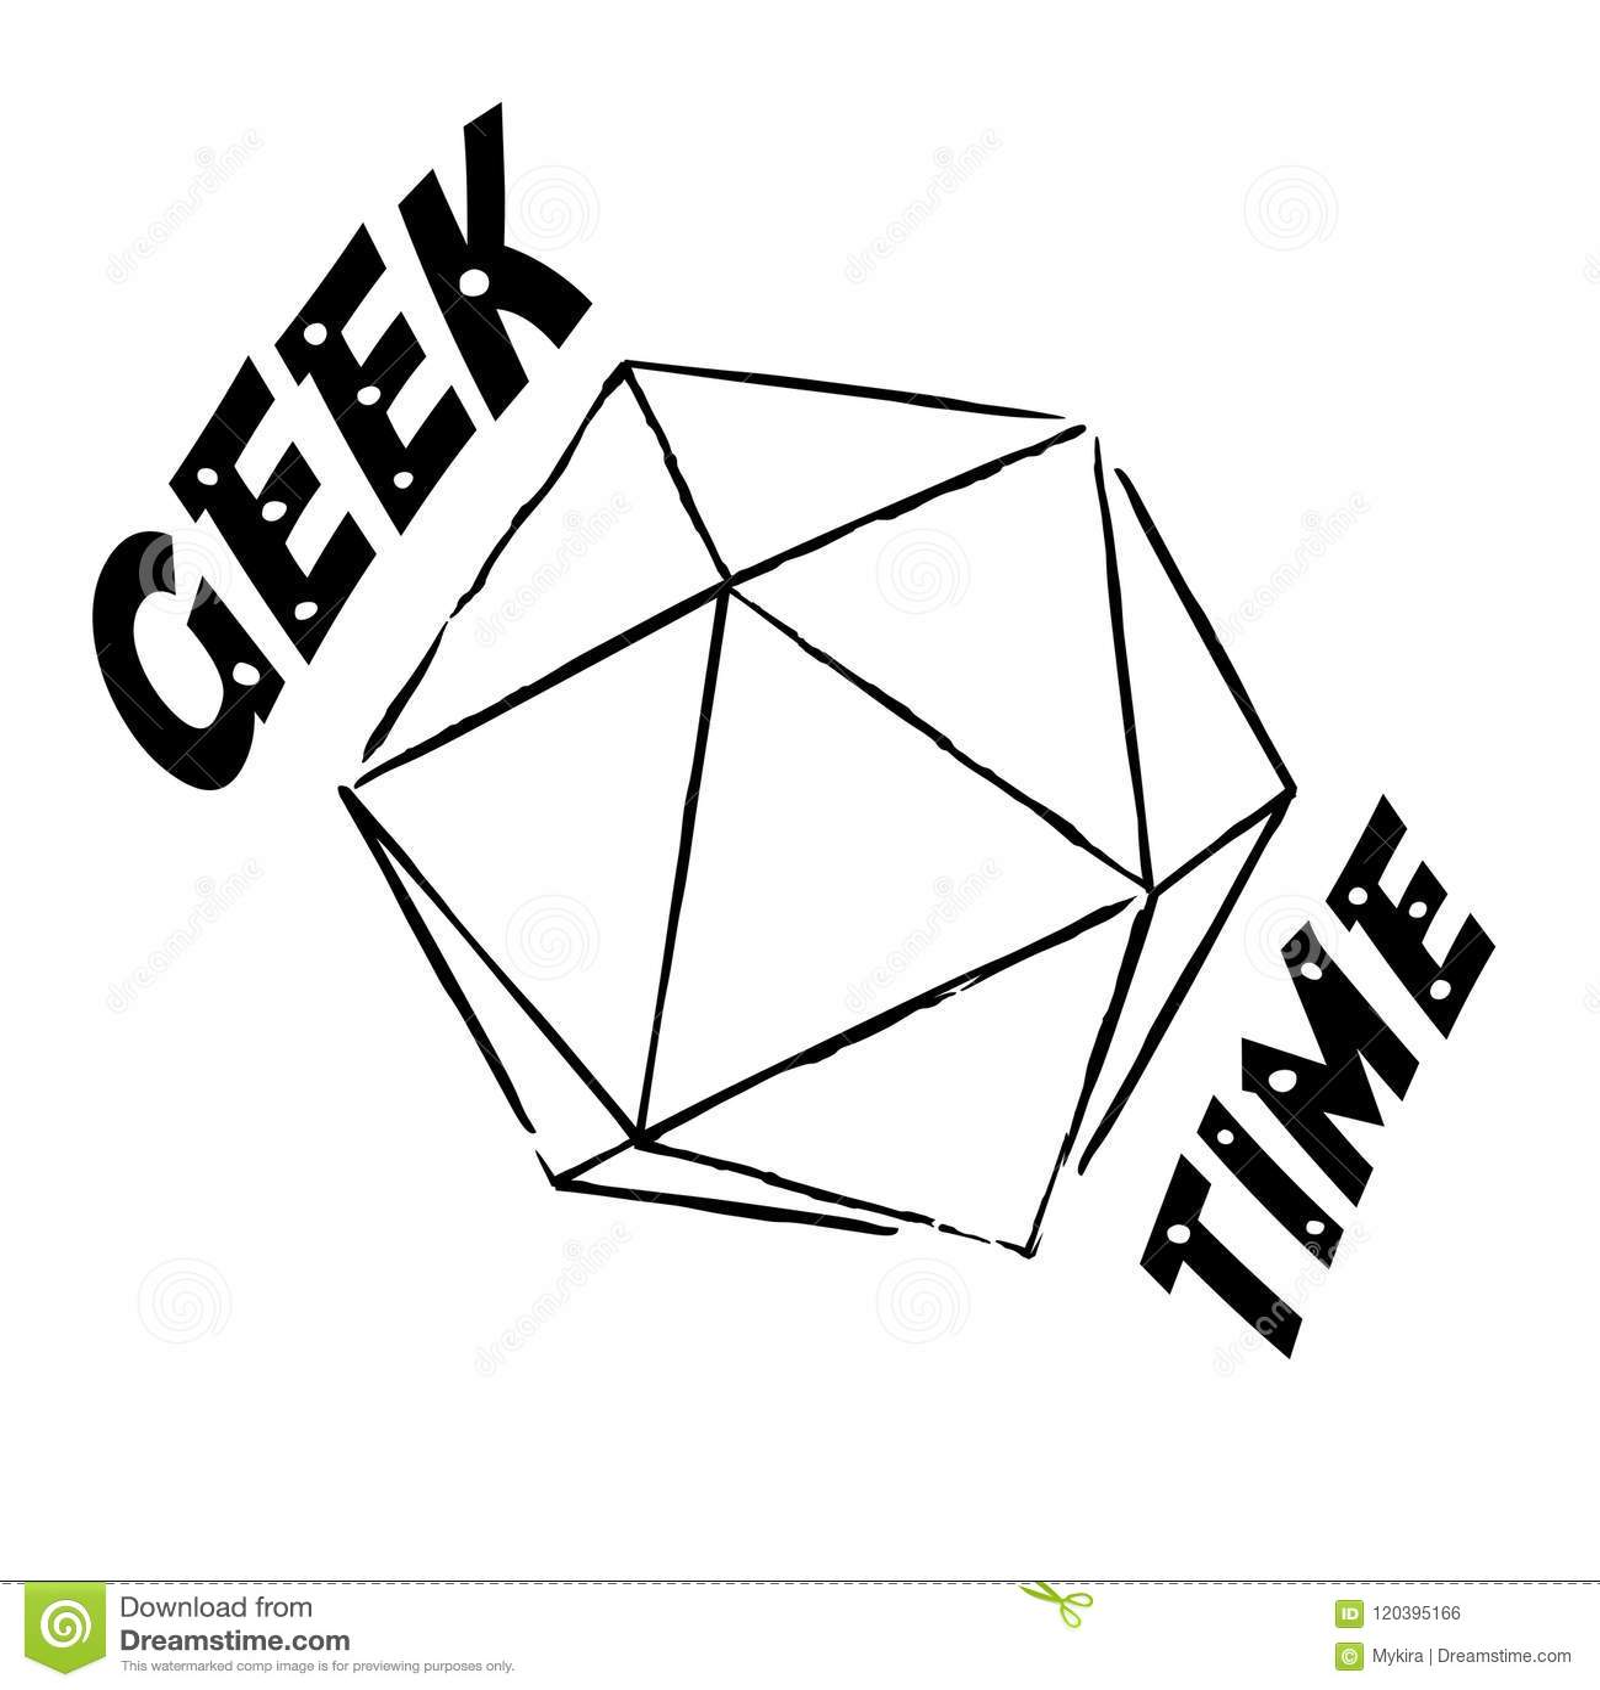 Download Vector Geek Time Illustration Stock Vector - Illustration of cartoon, science: 120395166